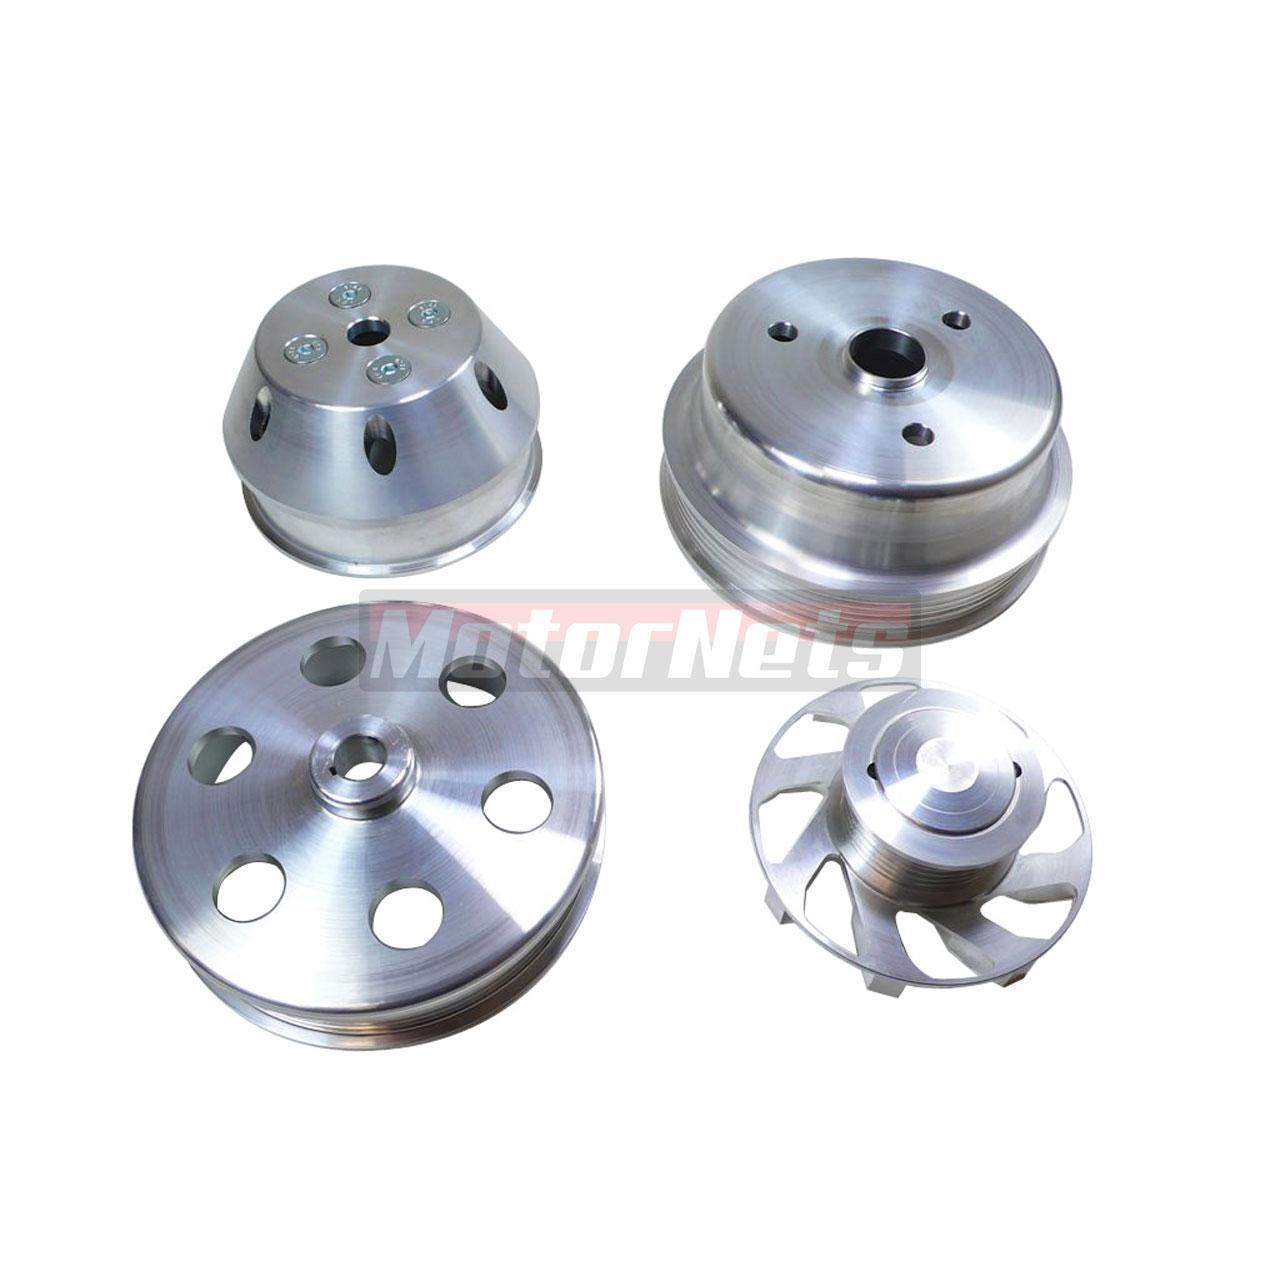 Stain Aluminum LWP SBC Crank Alternator Power Steering